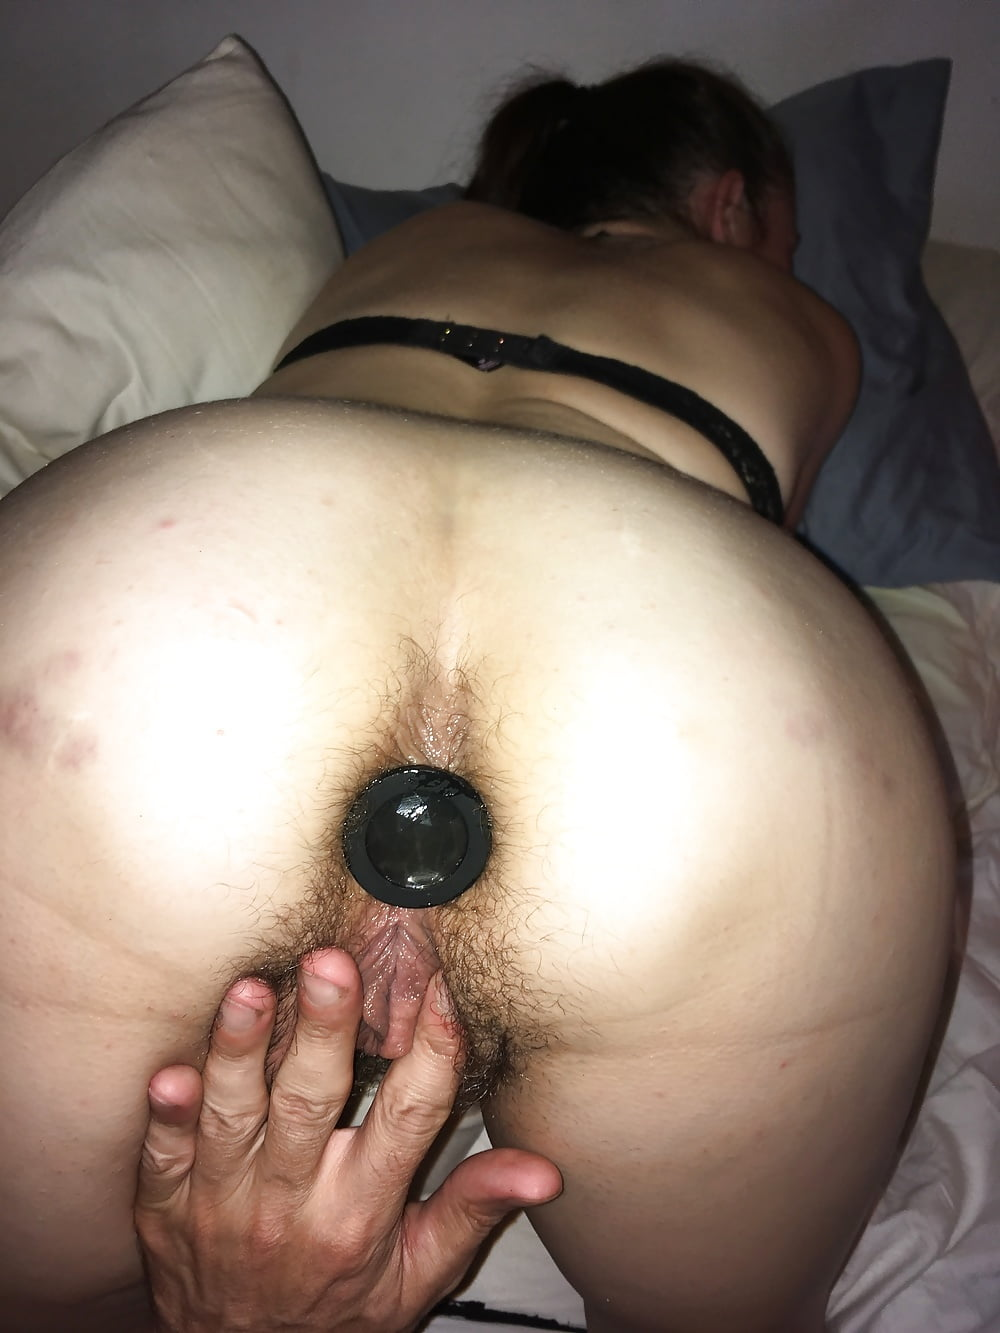 Best remote butt plug-1273